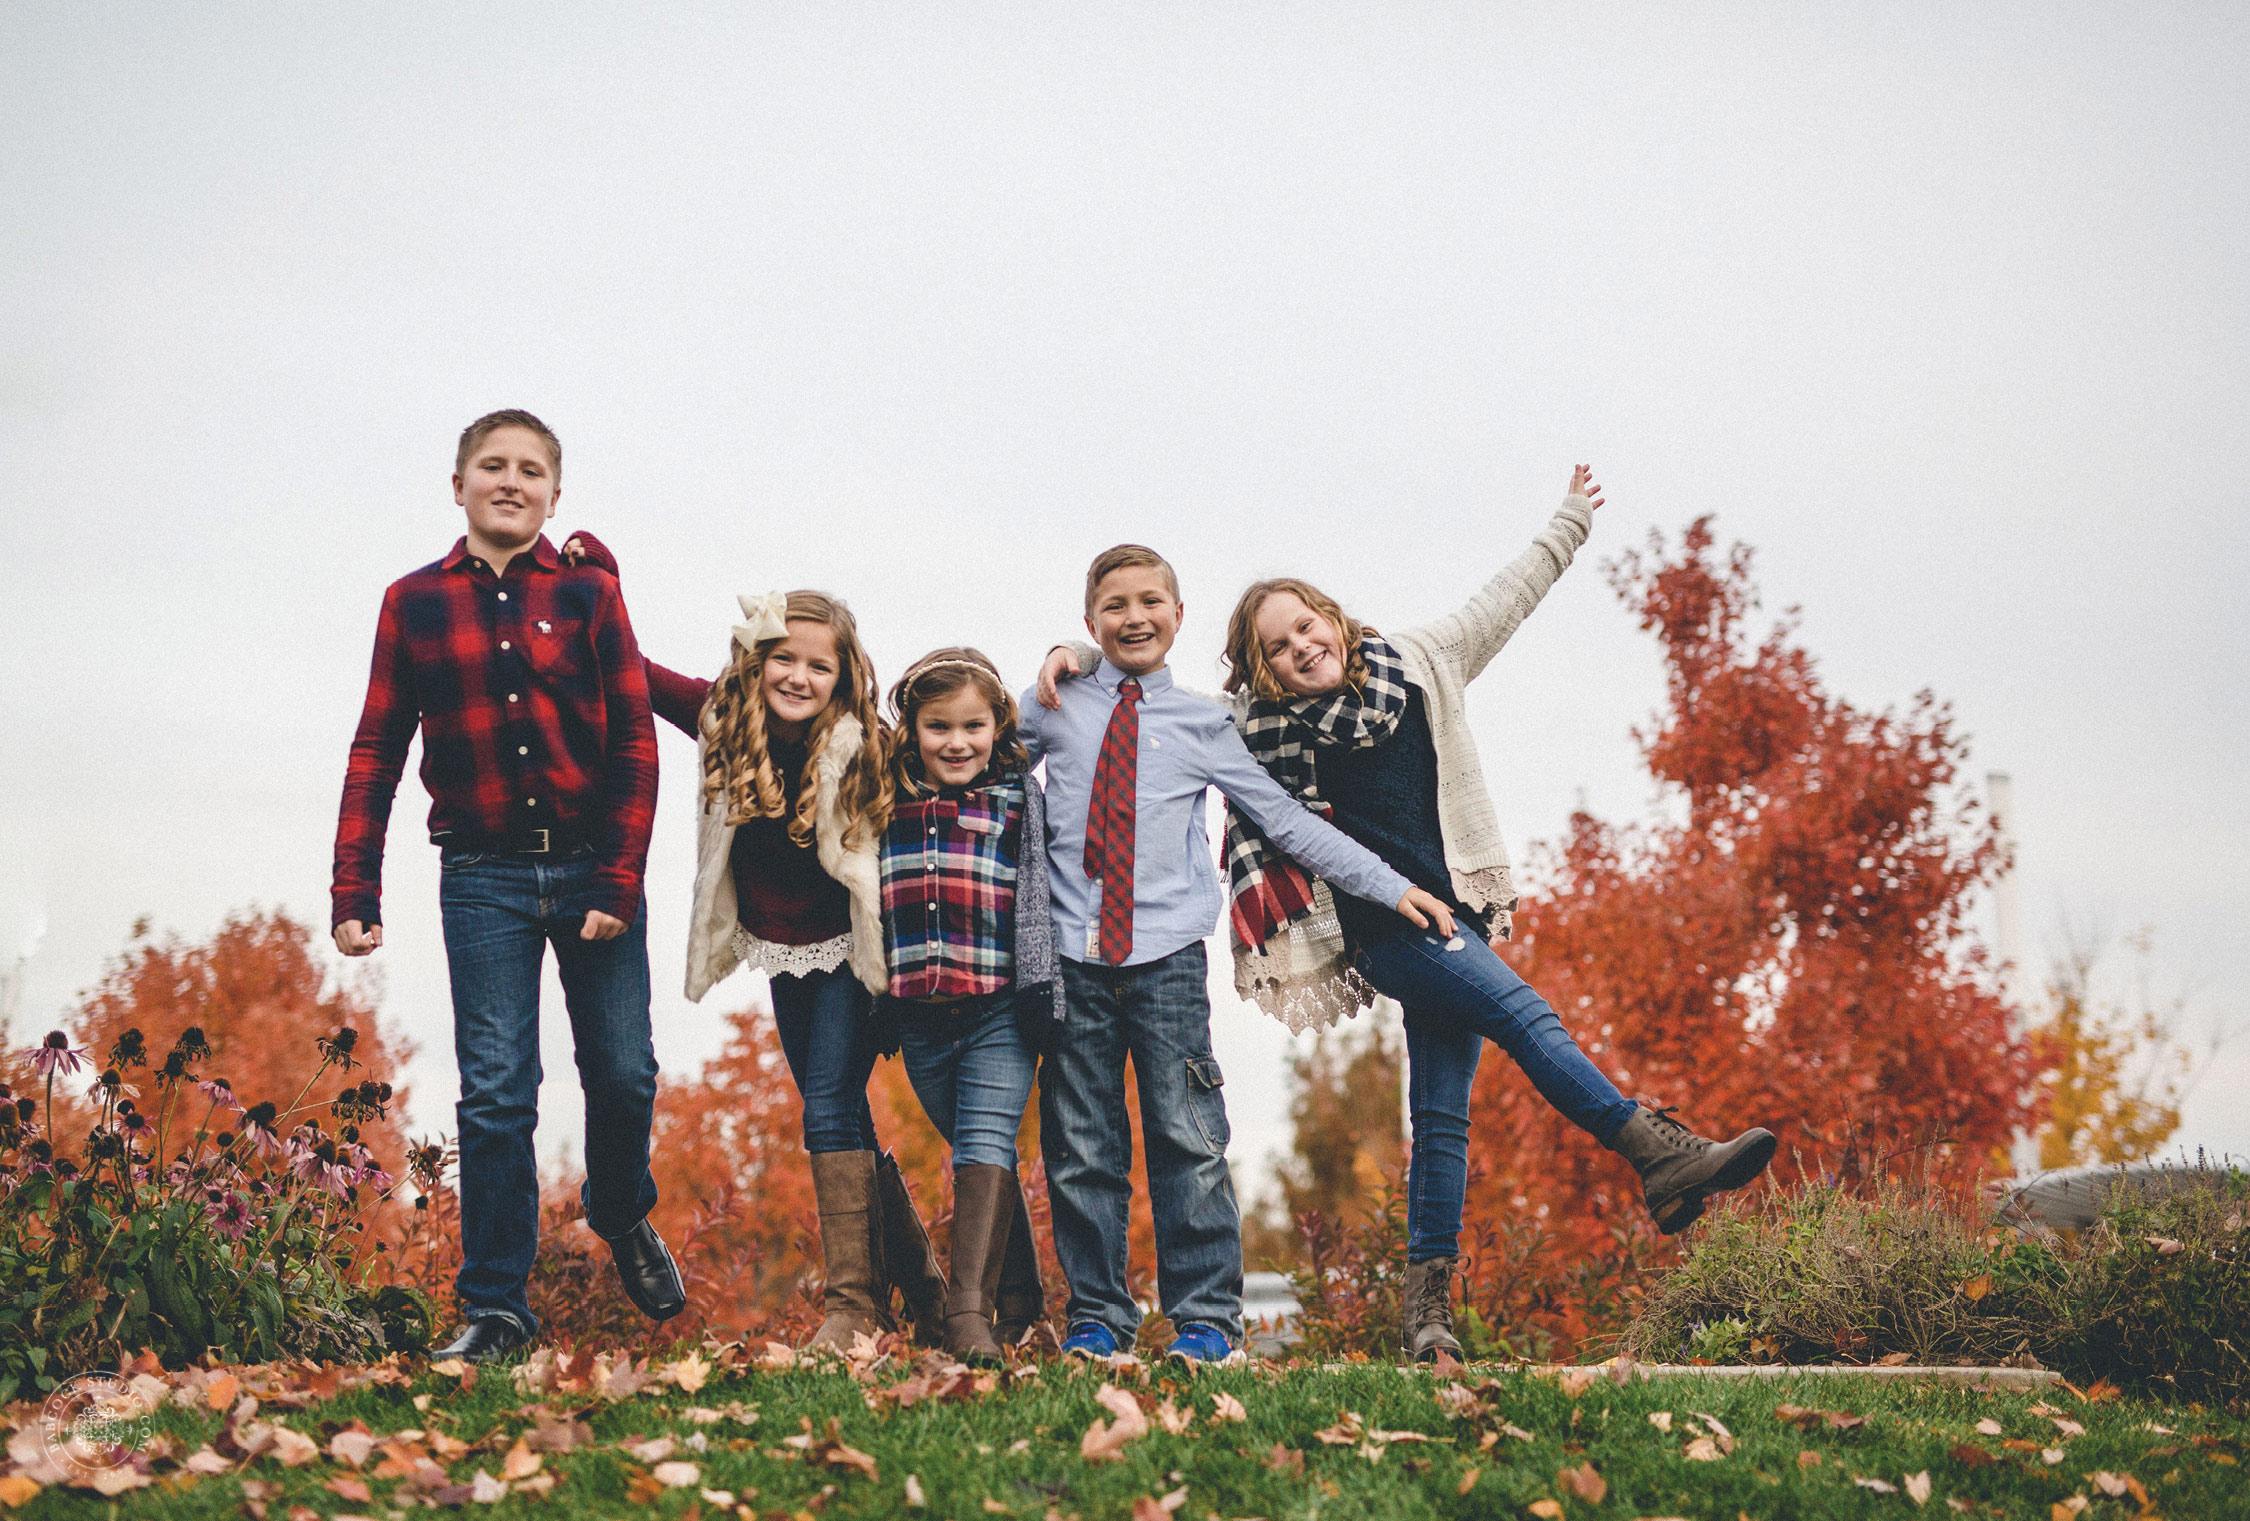 matichel-family-photographer-cincinnati-ohio-7.jpg